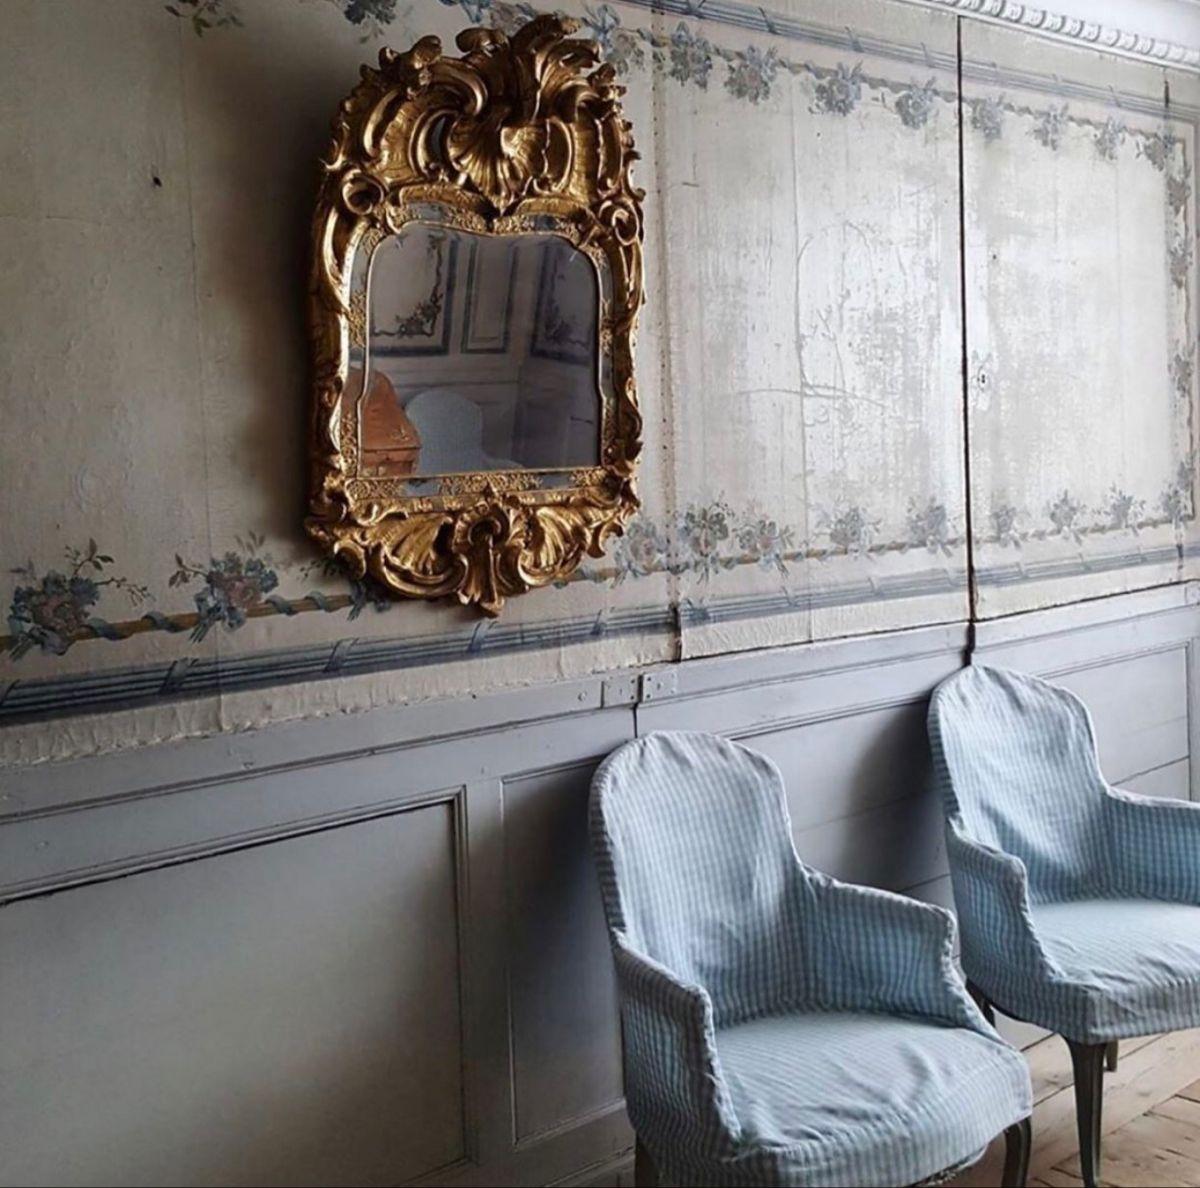 #antiquehome #antiqueprint #antiquefabric #inspired #dreamhome #furniture #antiques #vintagehome #vintagedecor #interiordesign #vintageliving #home #antiqueinterior